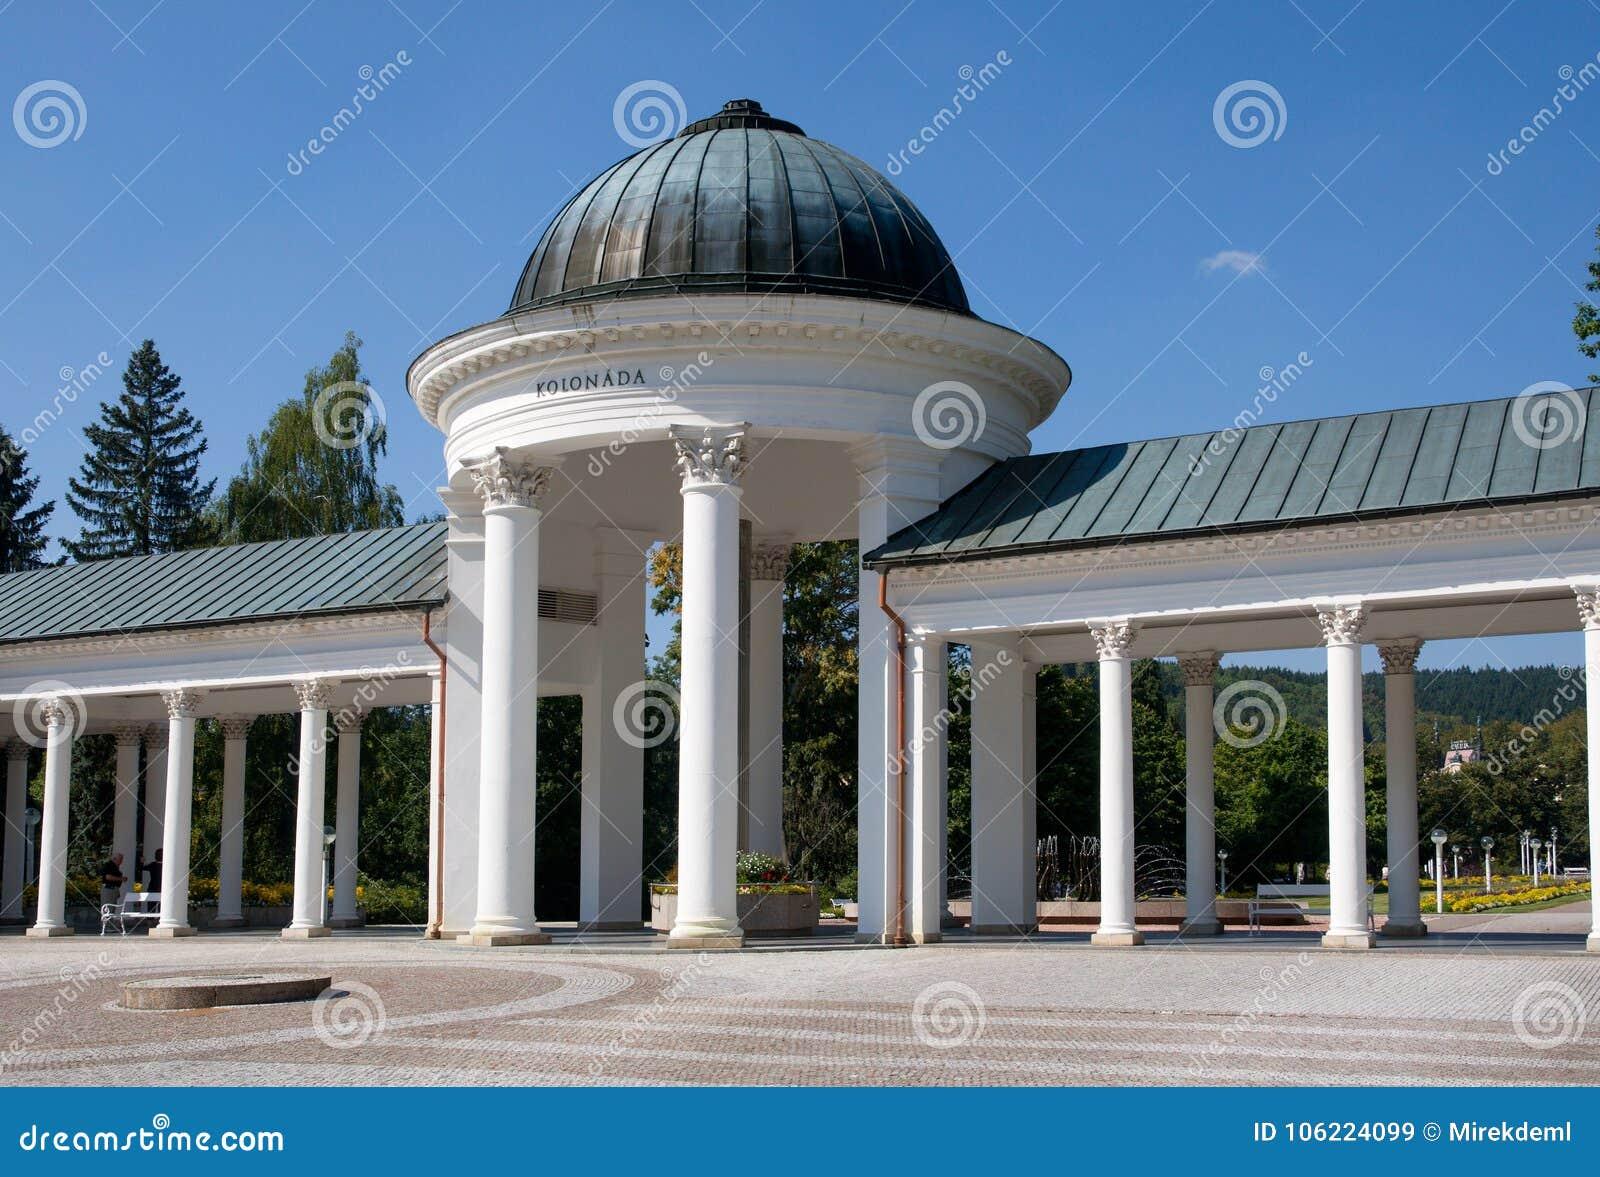 Colonnade in Marianske Lazne, Westelijke Bohemen, Tsjechische republiek